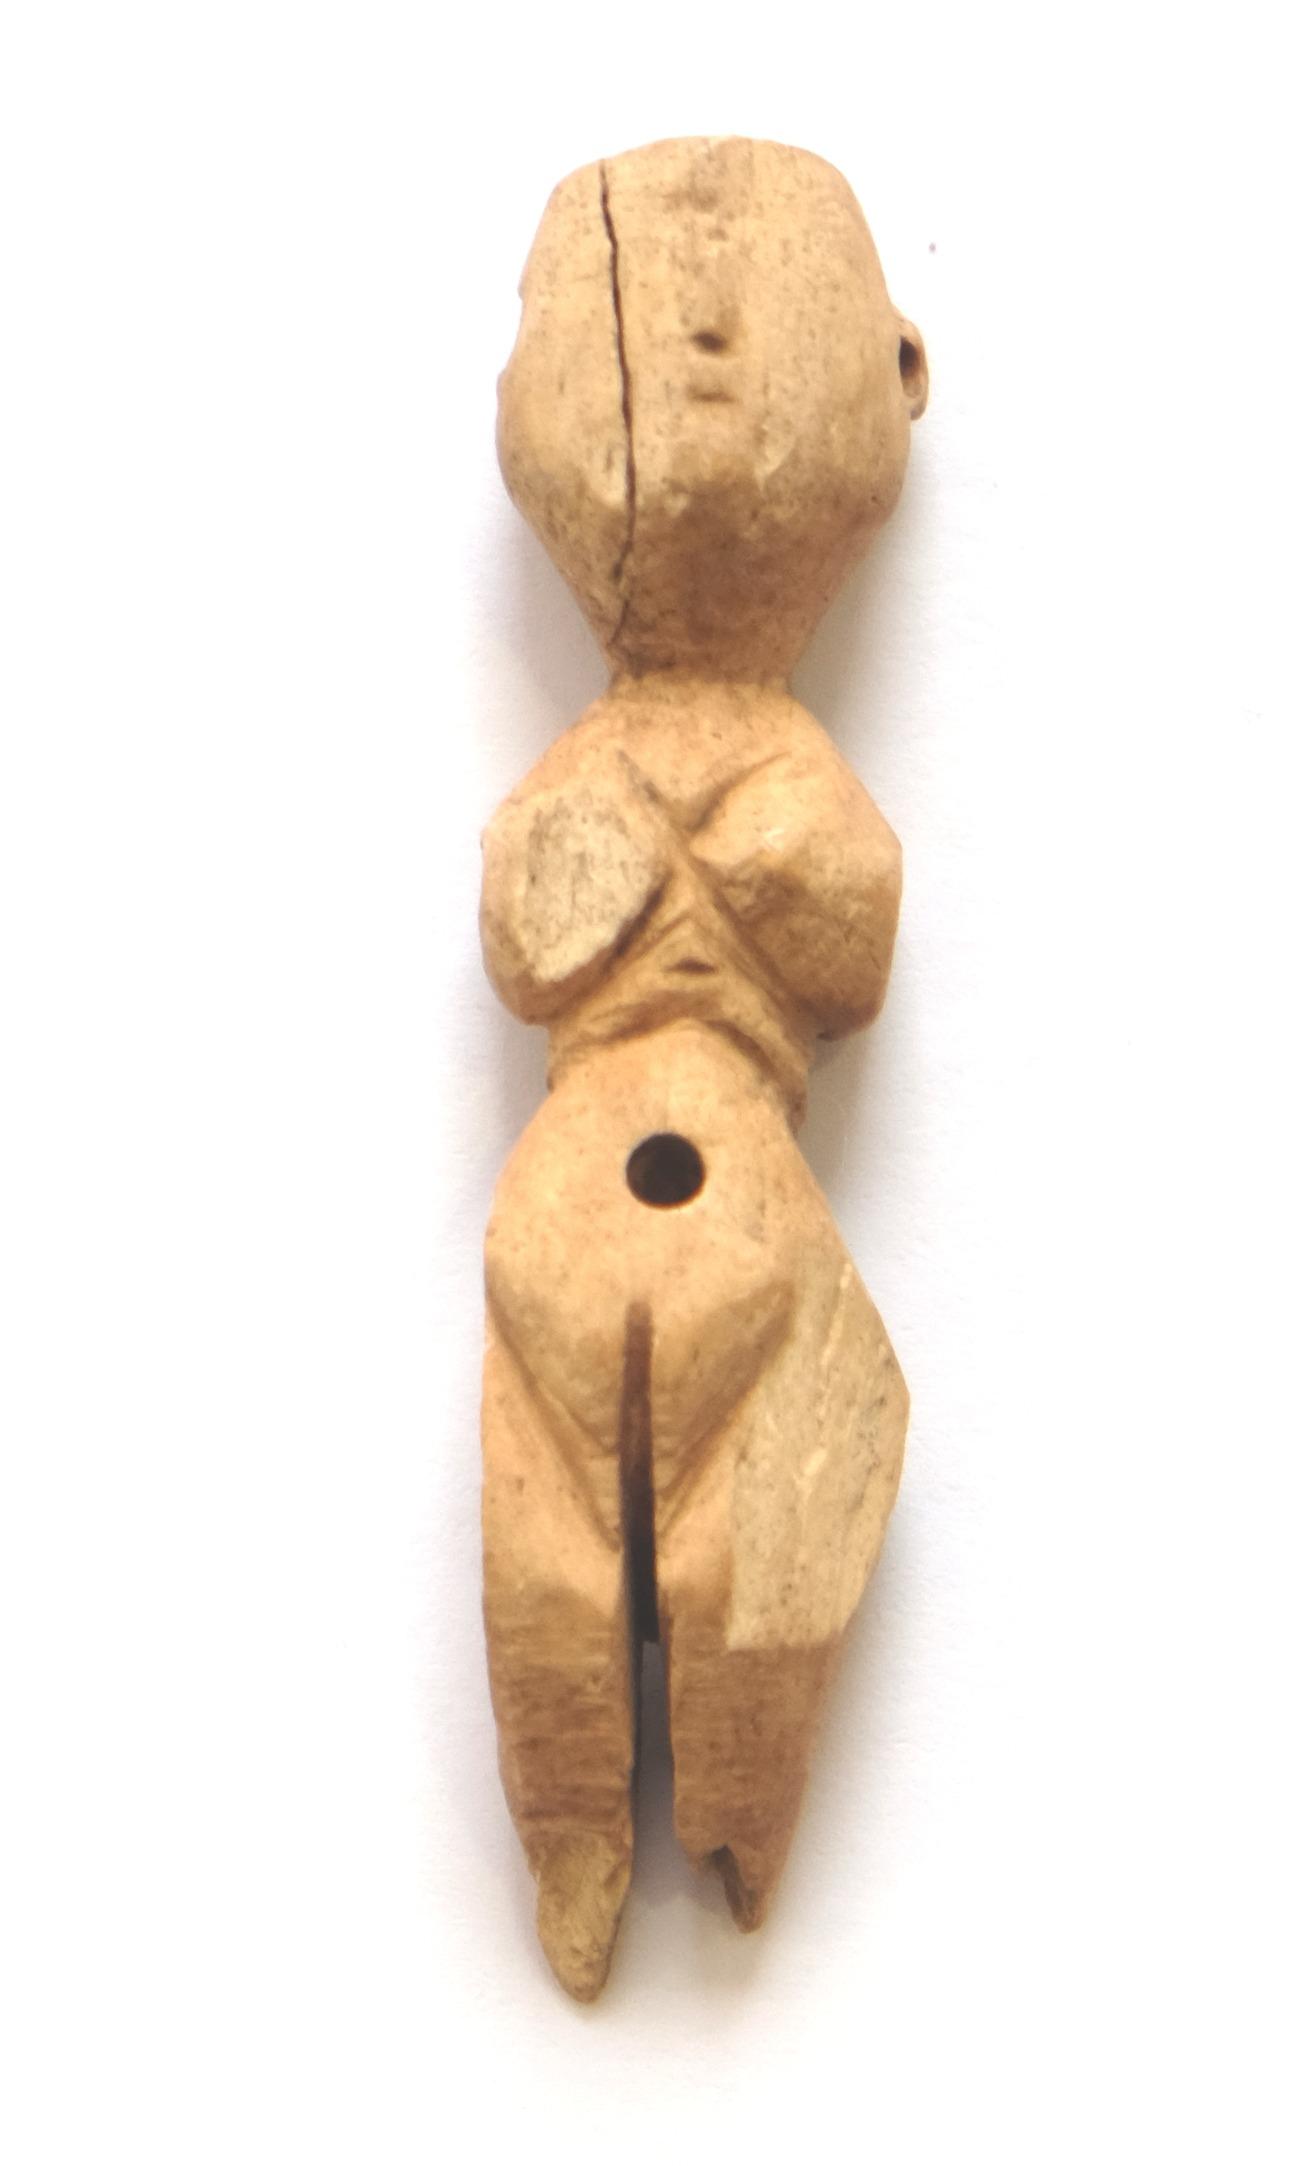 Image for: Bone figure